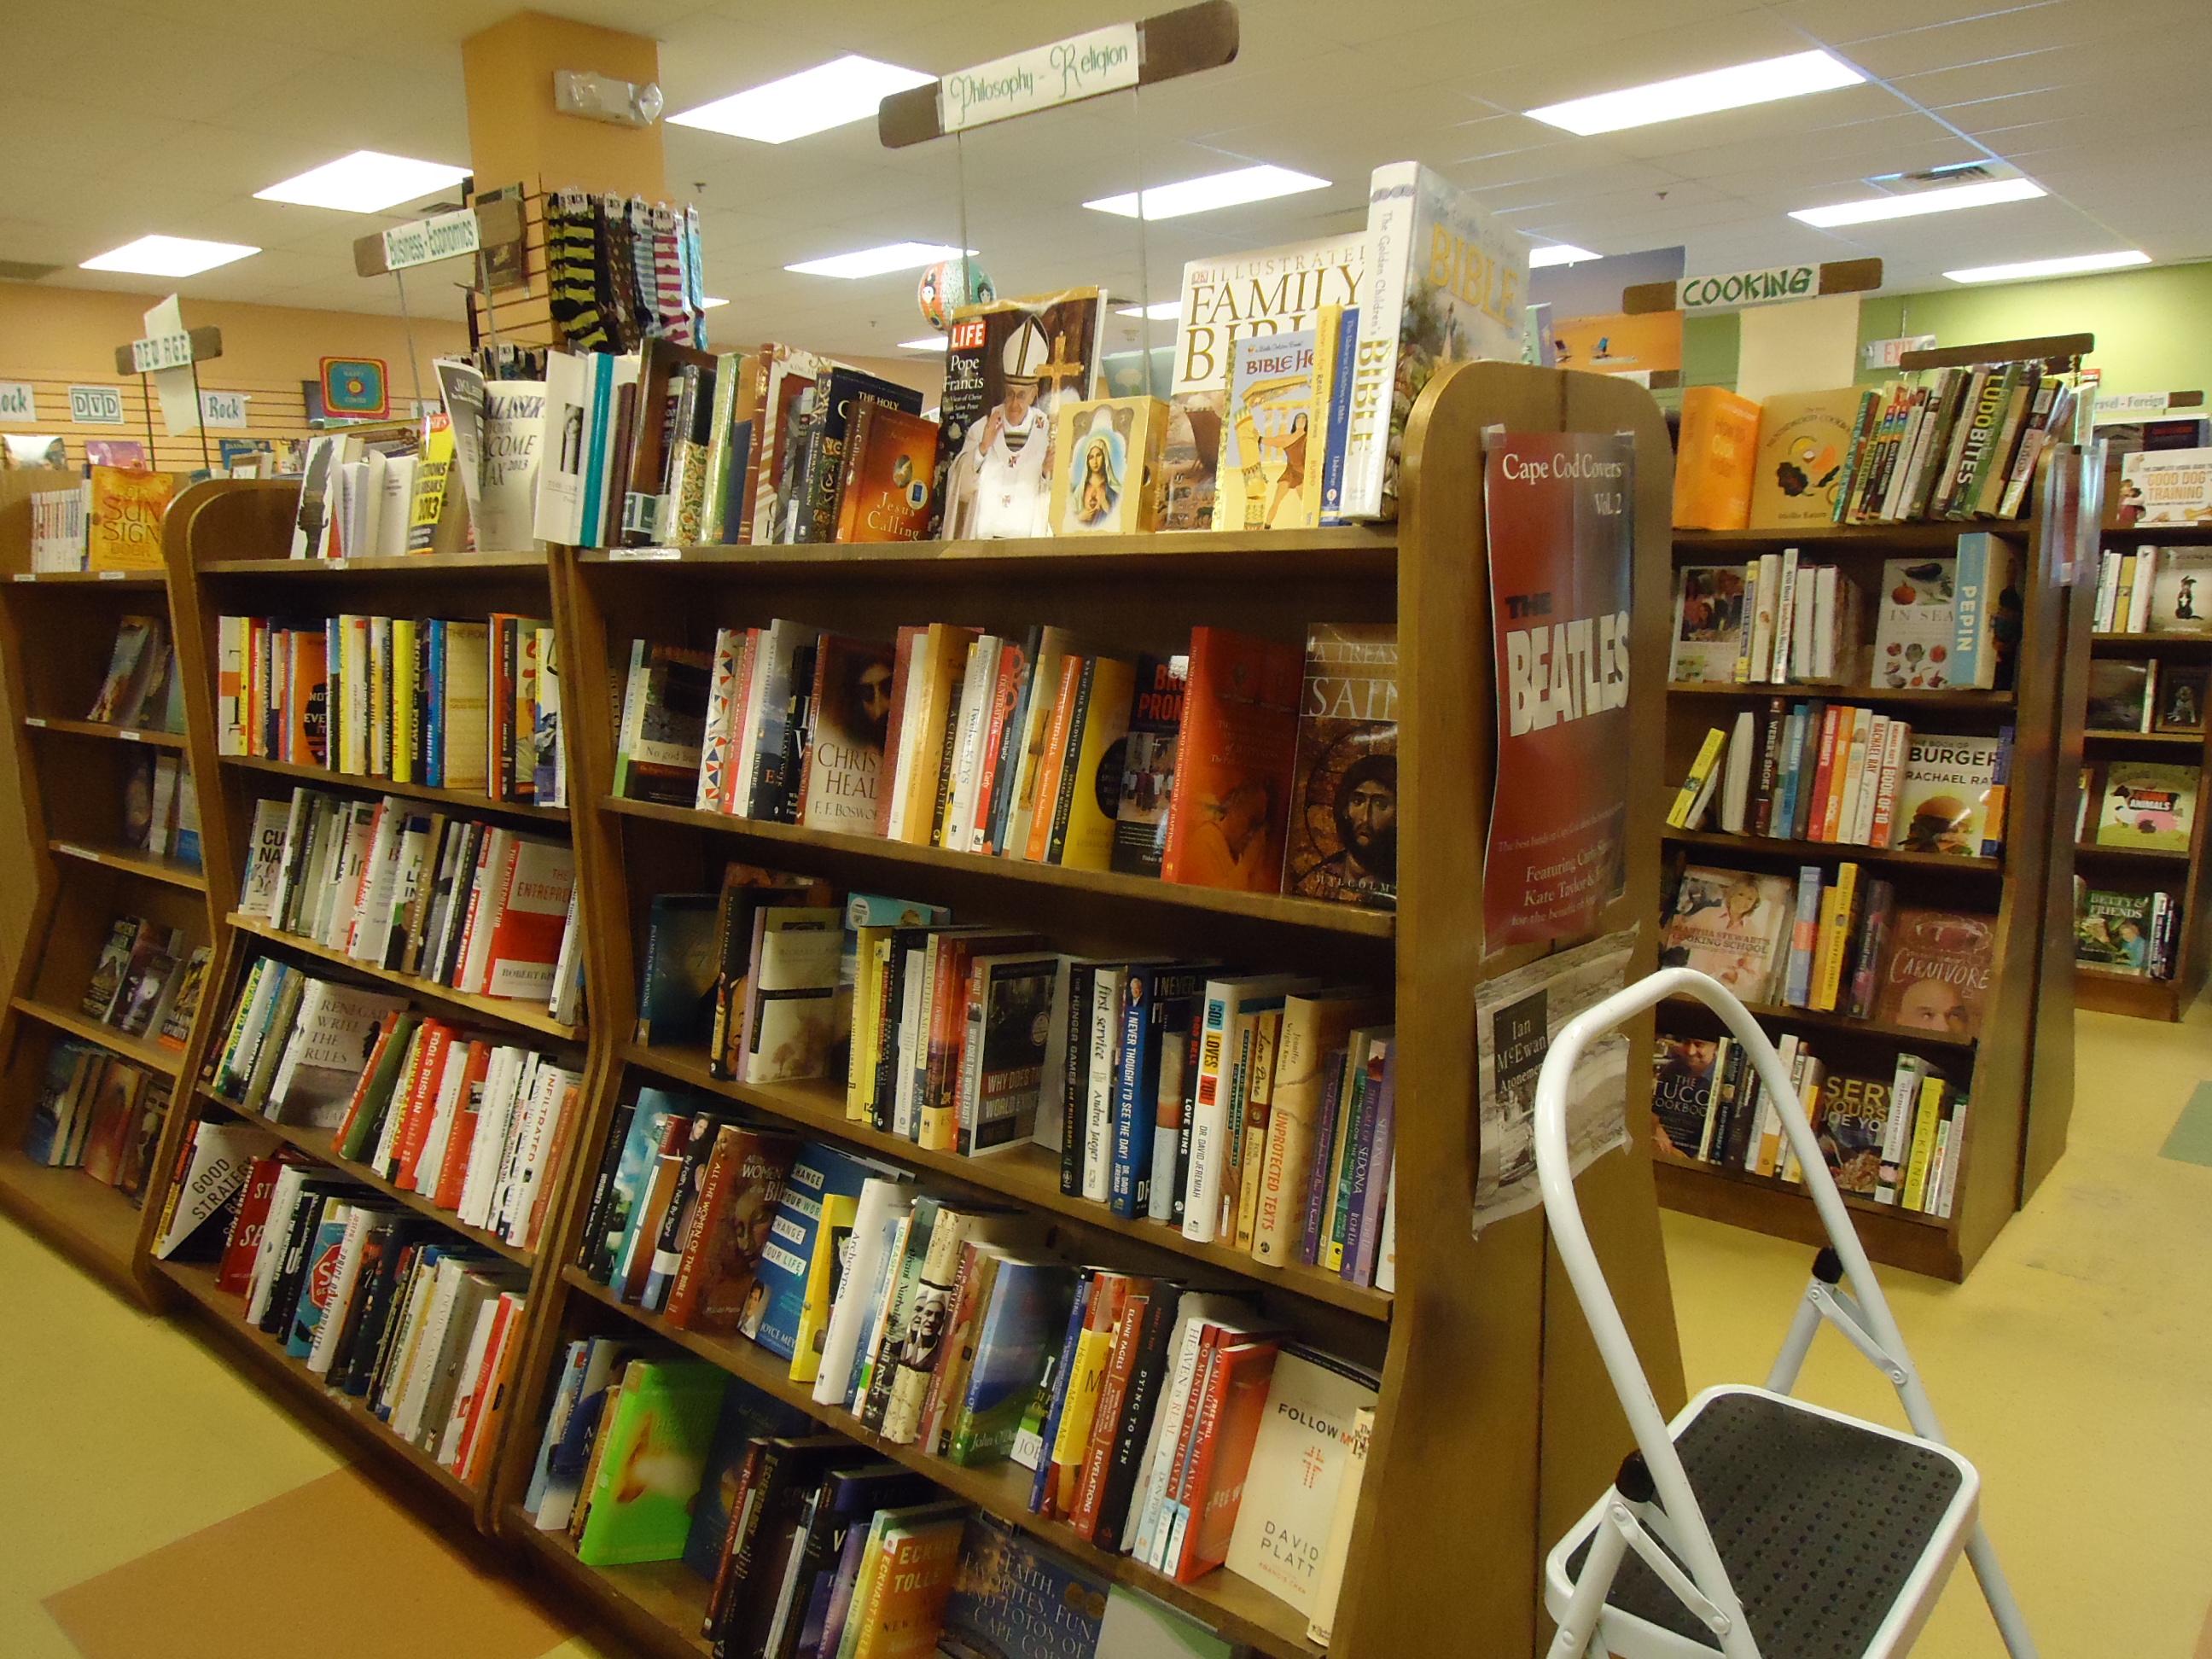 Bookstore shelves, Book, Books, Bookstore, Display, HQ Photo